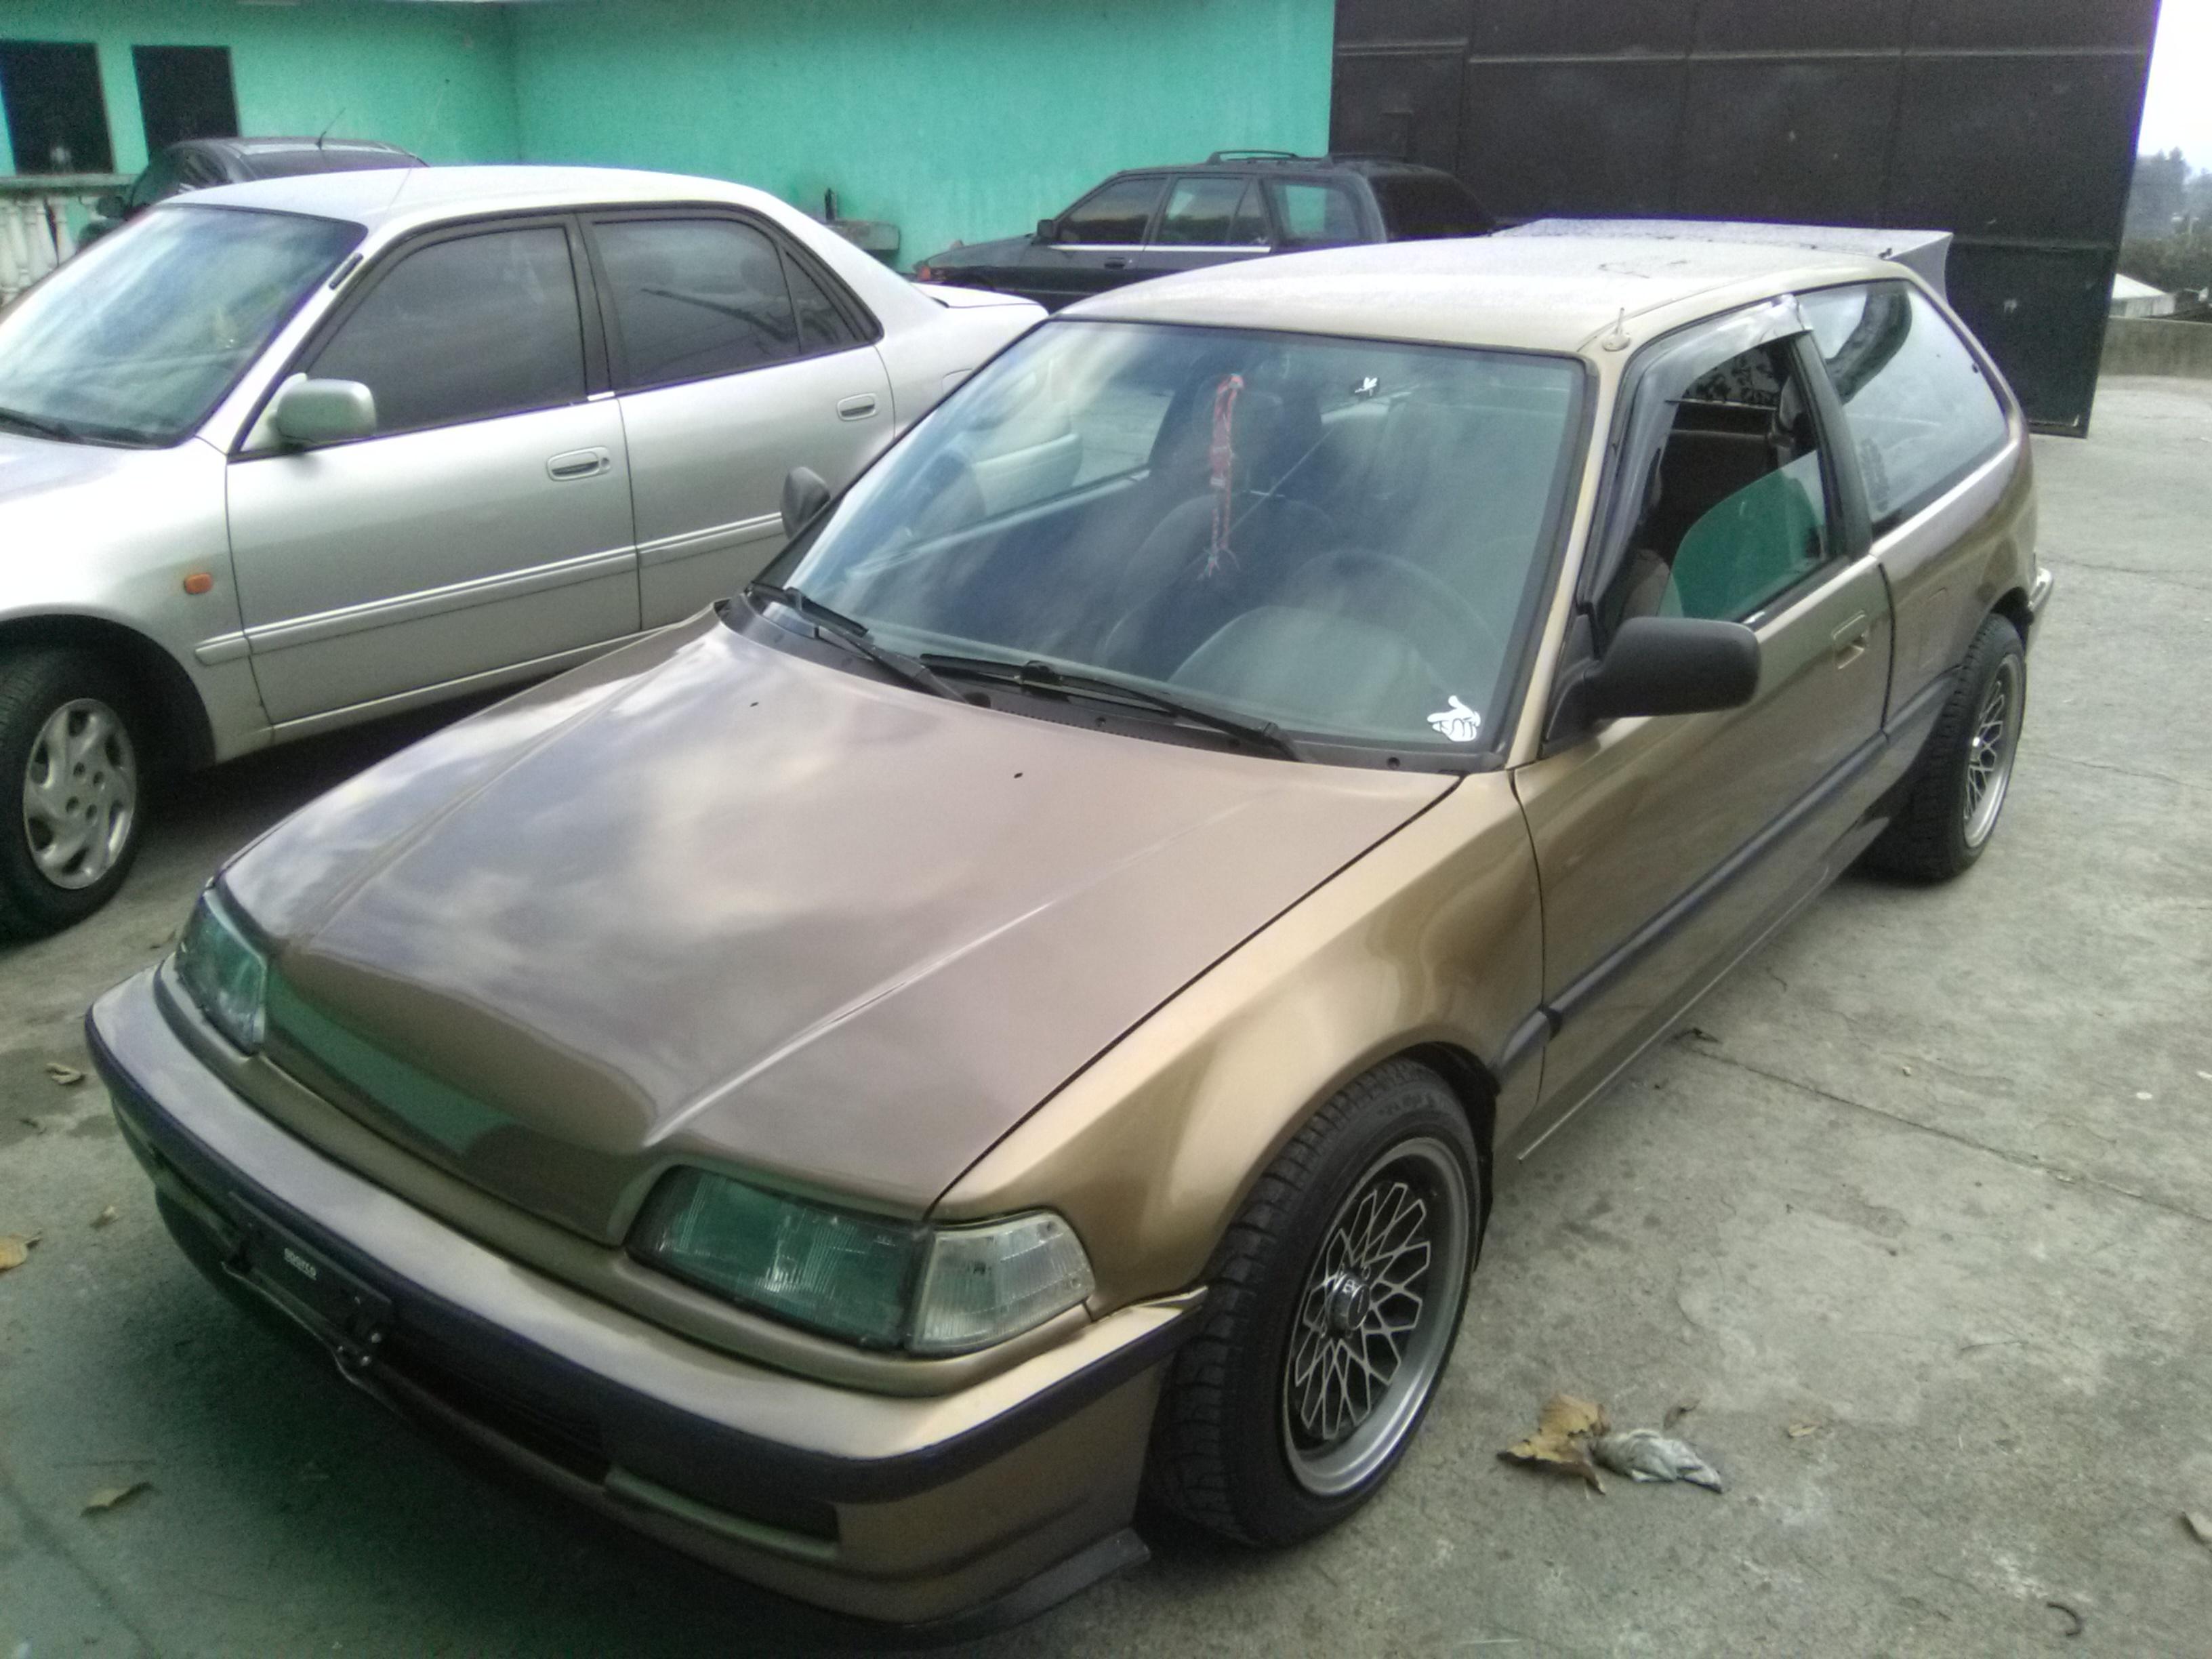 Usados: Honda Civic 1990 en Guatemala City - Carros Guatemala